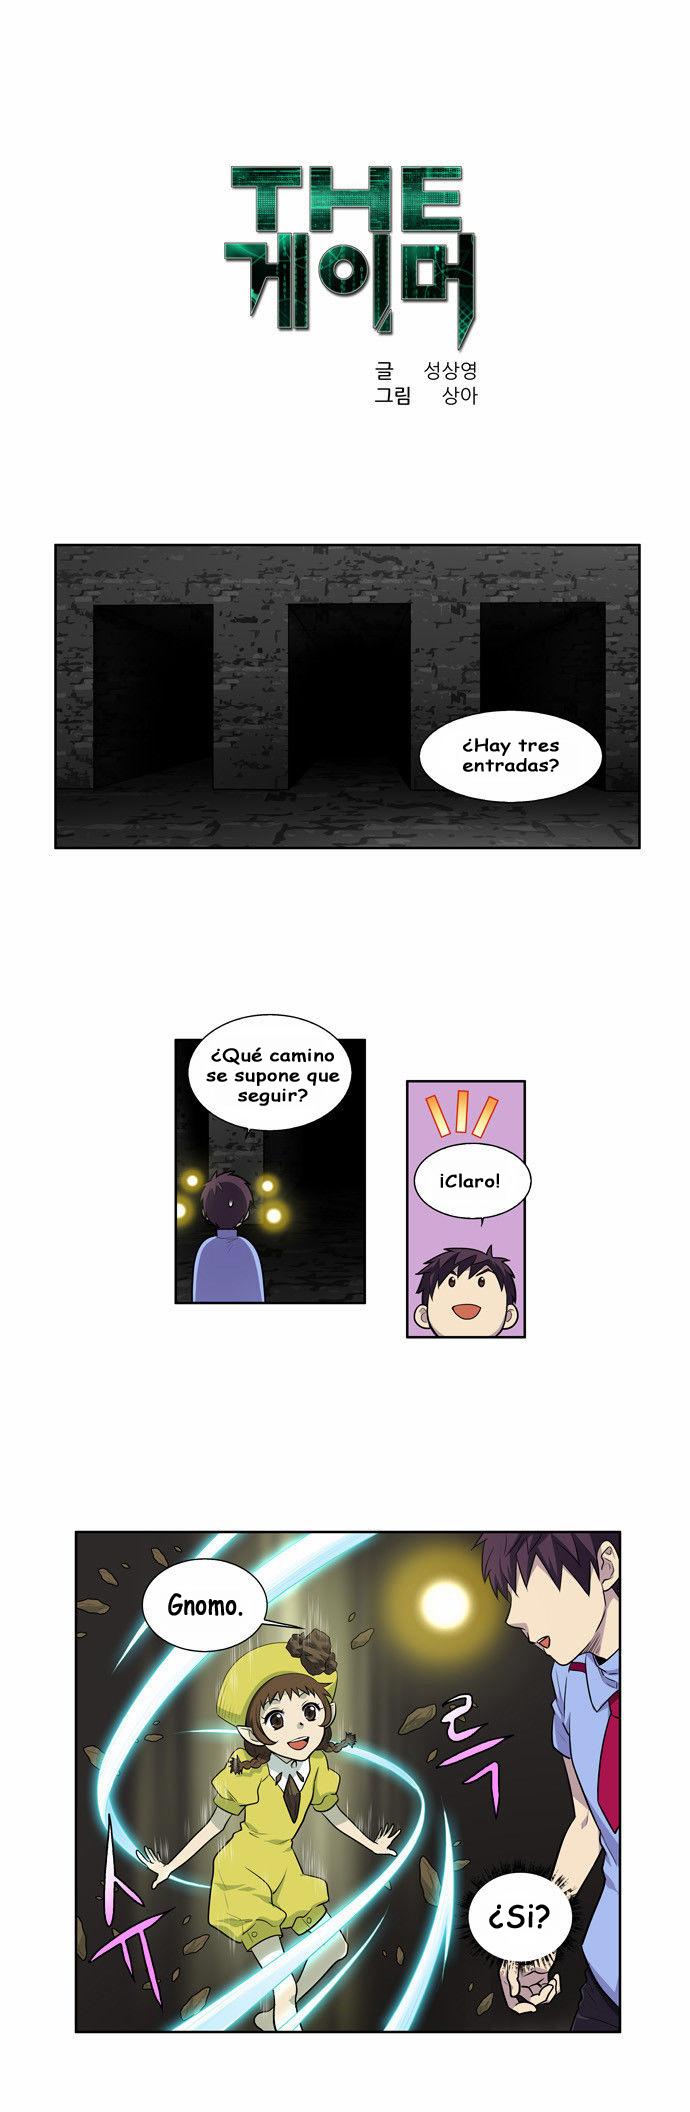 http://c5.ninemanga.com/es_manga/61/1725/396909/c557f539a03d2ed26ee4a509712c4eb0.jpg Page 1